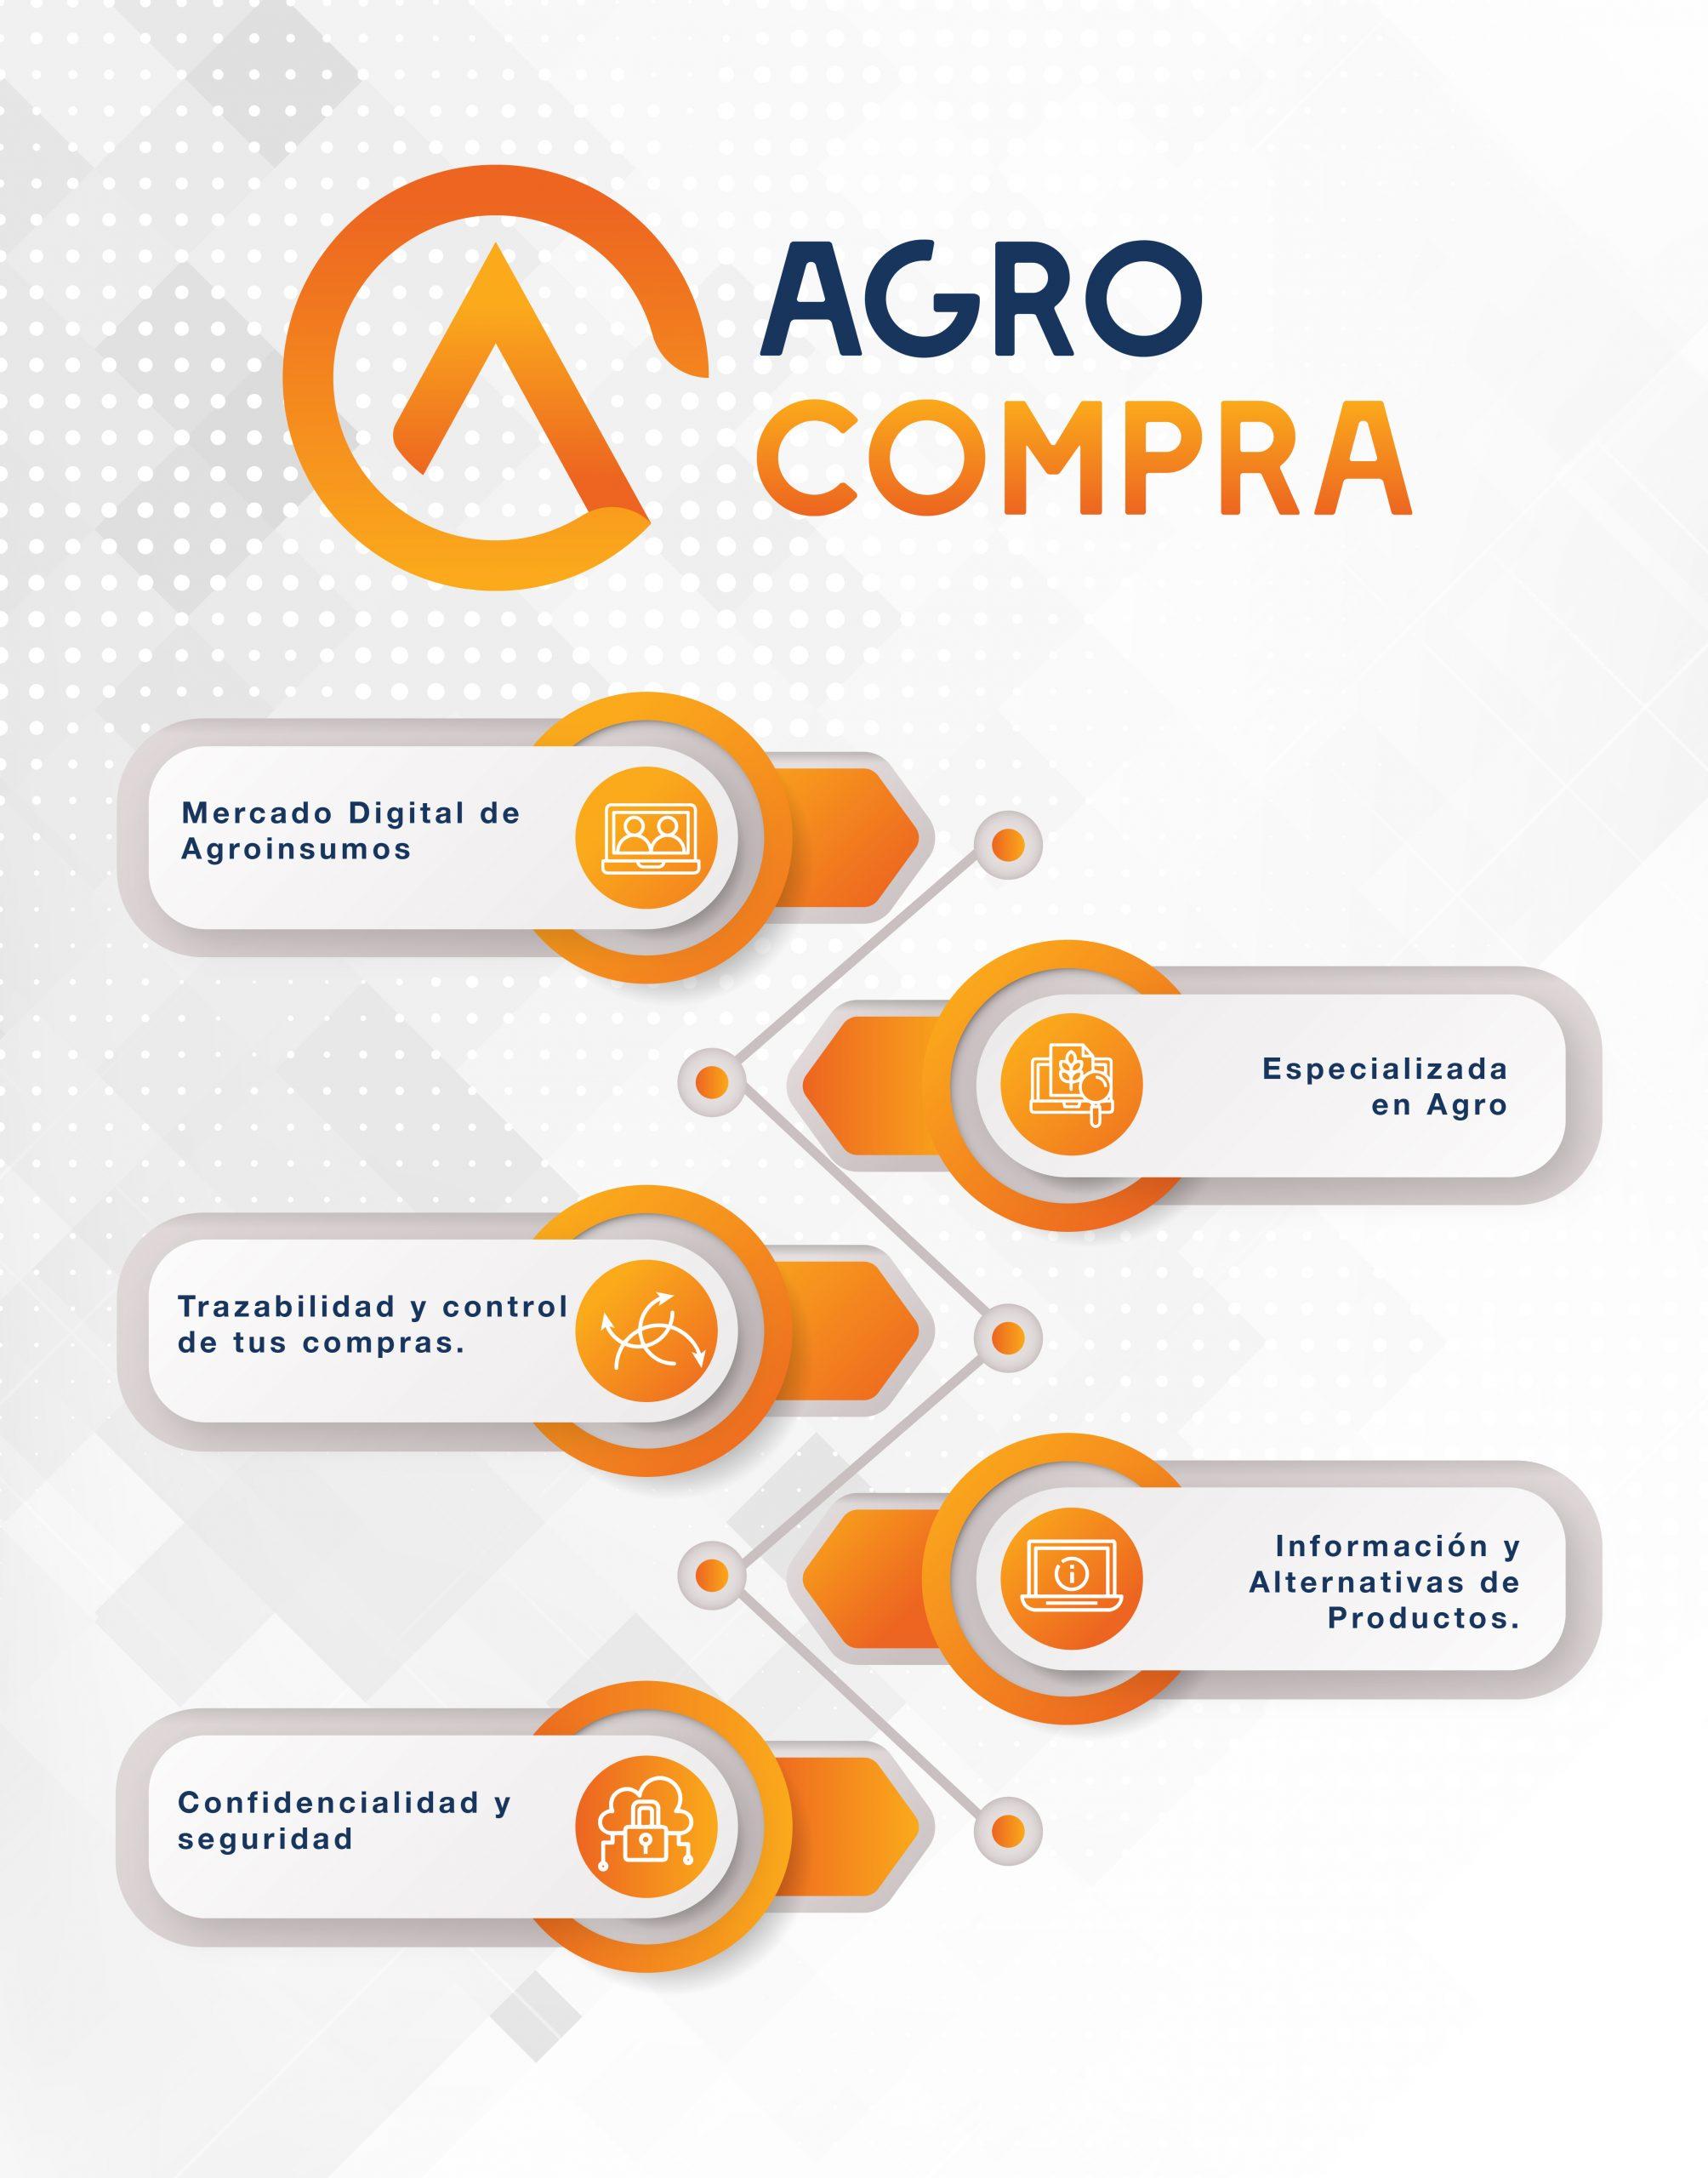 Agrocompra